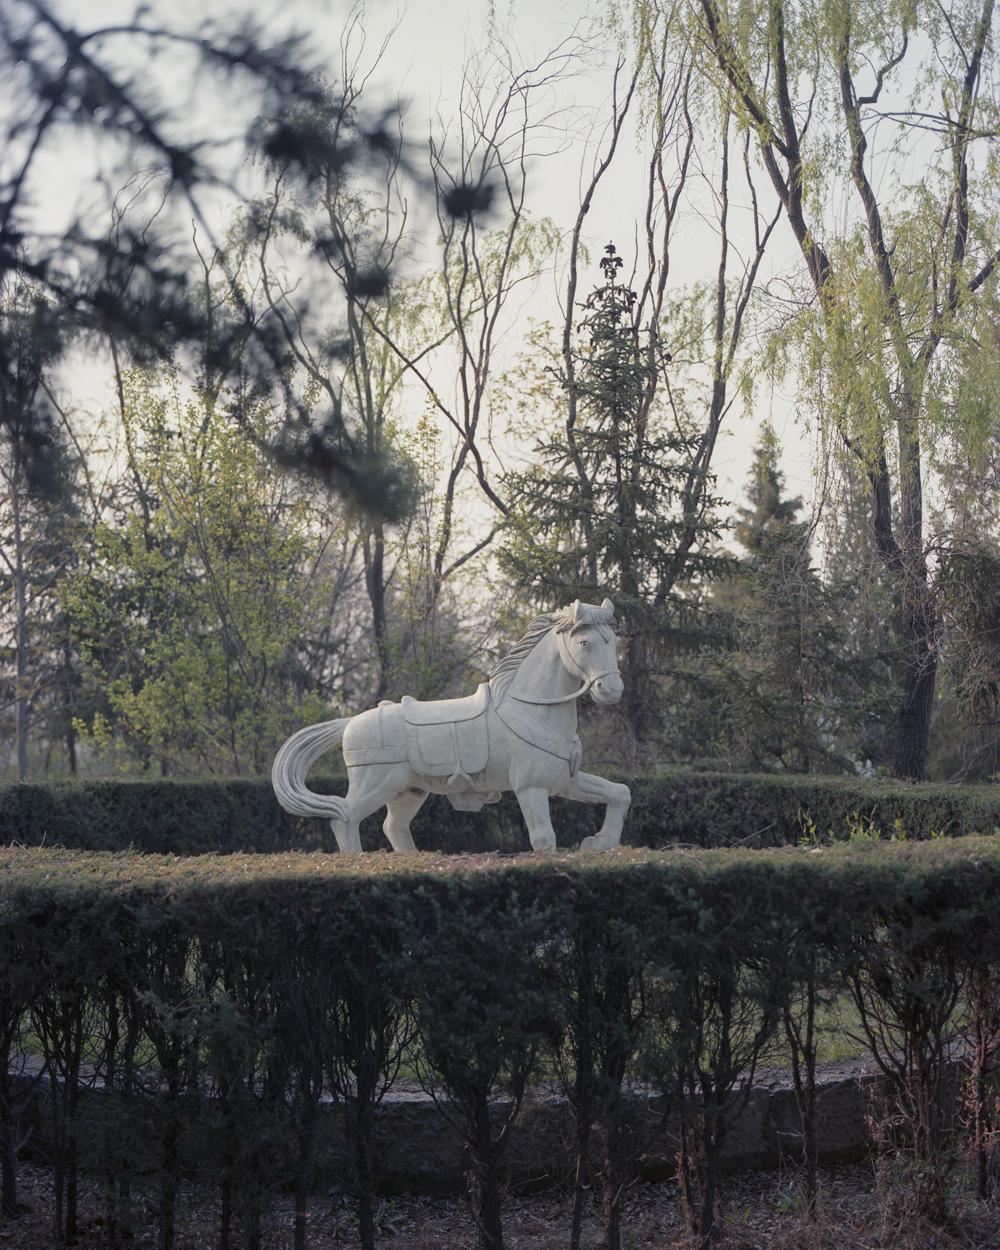 A statue of a white horse, in Dazhai Village, Shanxi province, April 19, 2021. Shi Yangkun/Sixth Tone